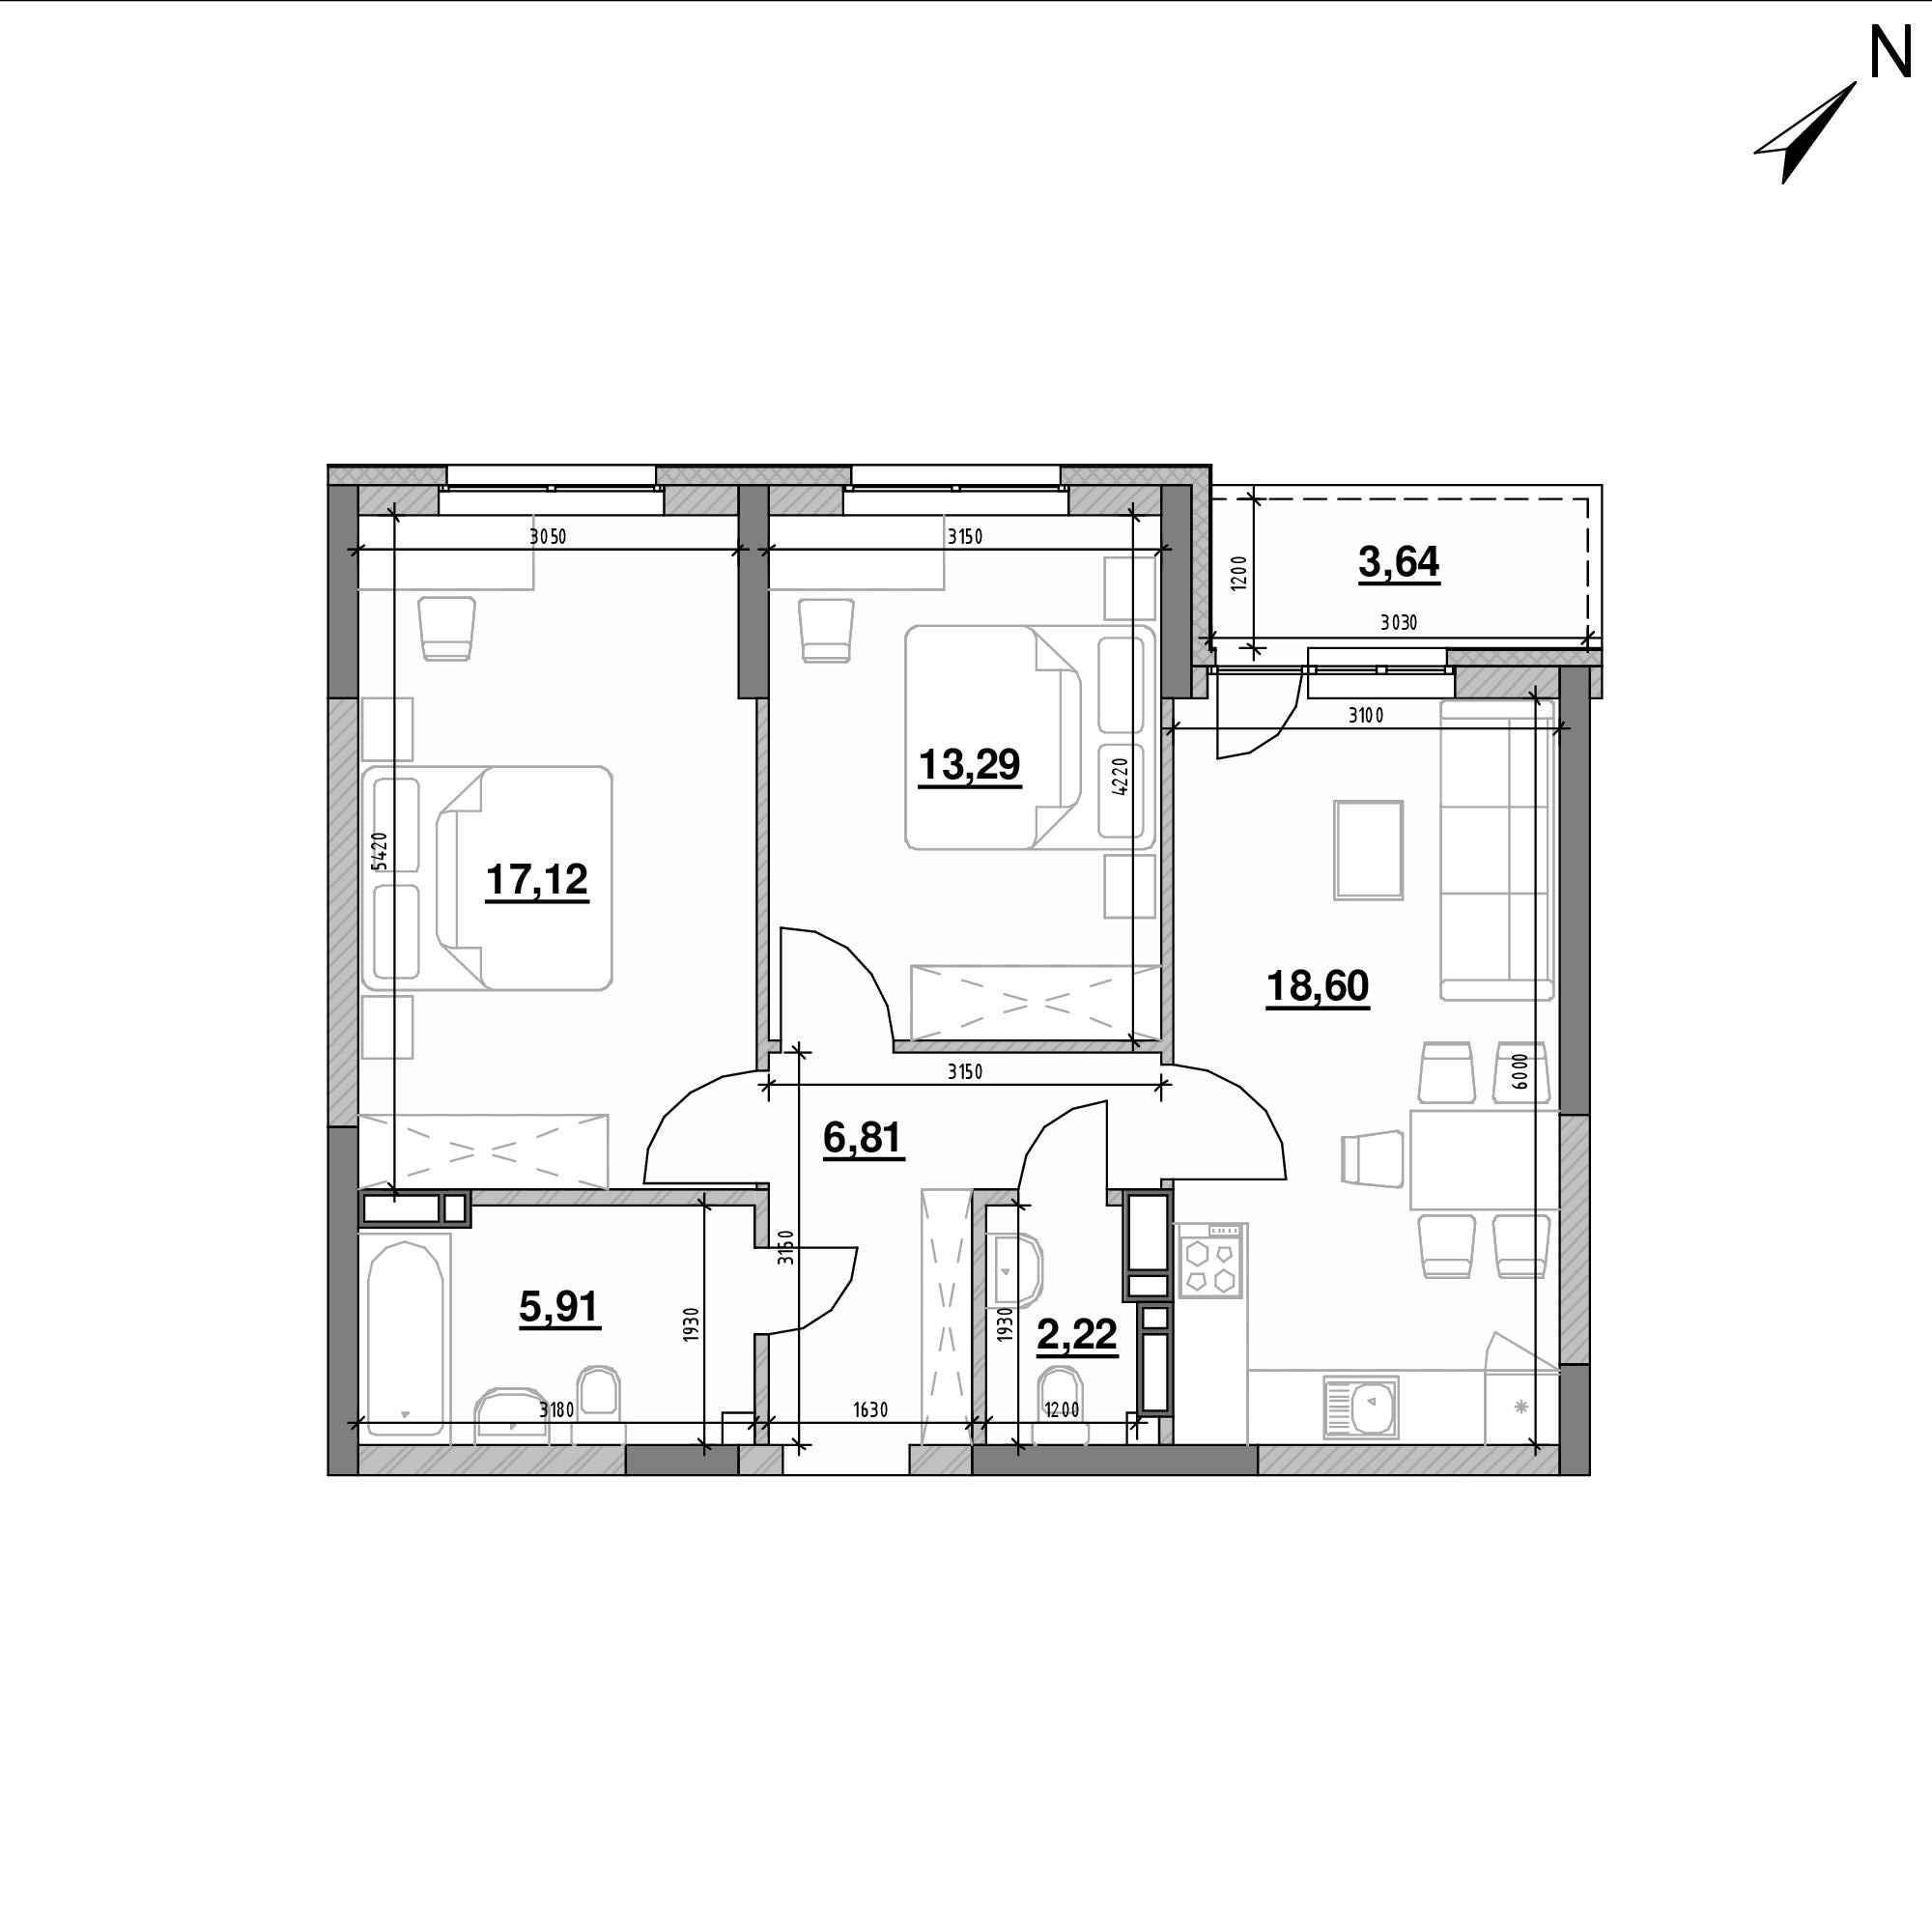 ЖК Оk'Land: планування 2-кімнатної квартири, №292, 67.59 м<sup>2</sup>